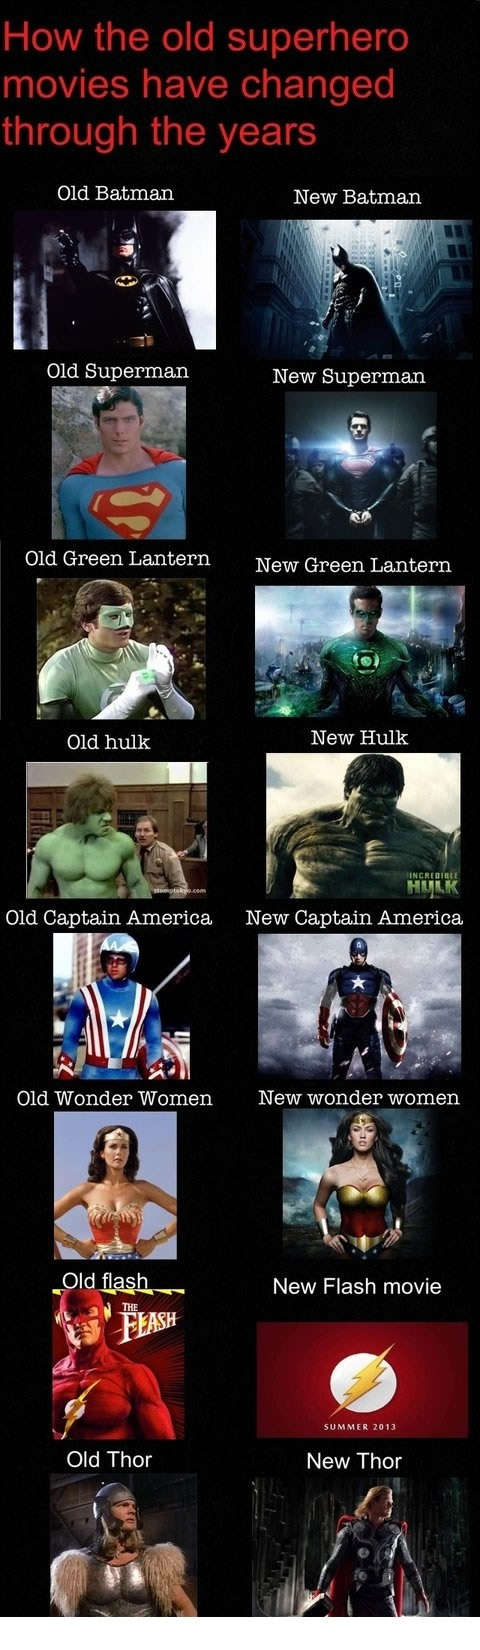 Evolution of superhero movies.